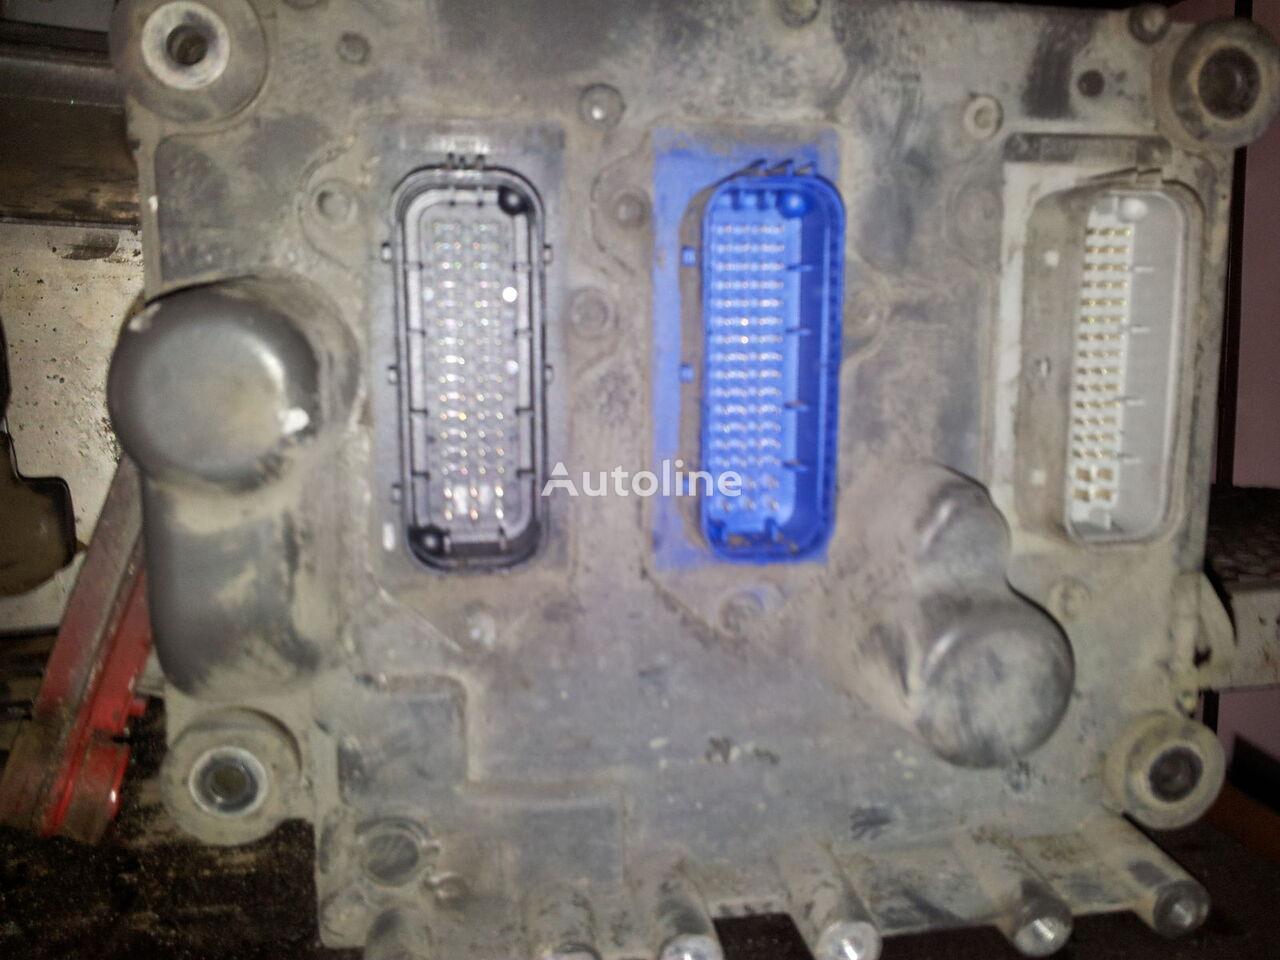 upravljačka jedinica  DAF 105XF EURO5 electronic control unit ECU EDC engine managment, engine control unit, DMCI 1679021; 1684367, 1664539, 1679021, 1684367, 1887331 za tegljača DAF 105XF